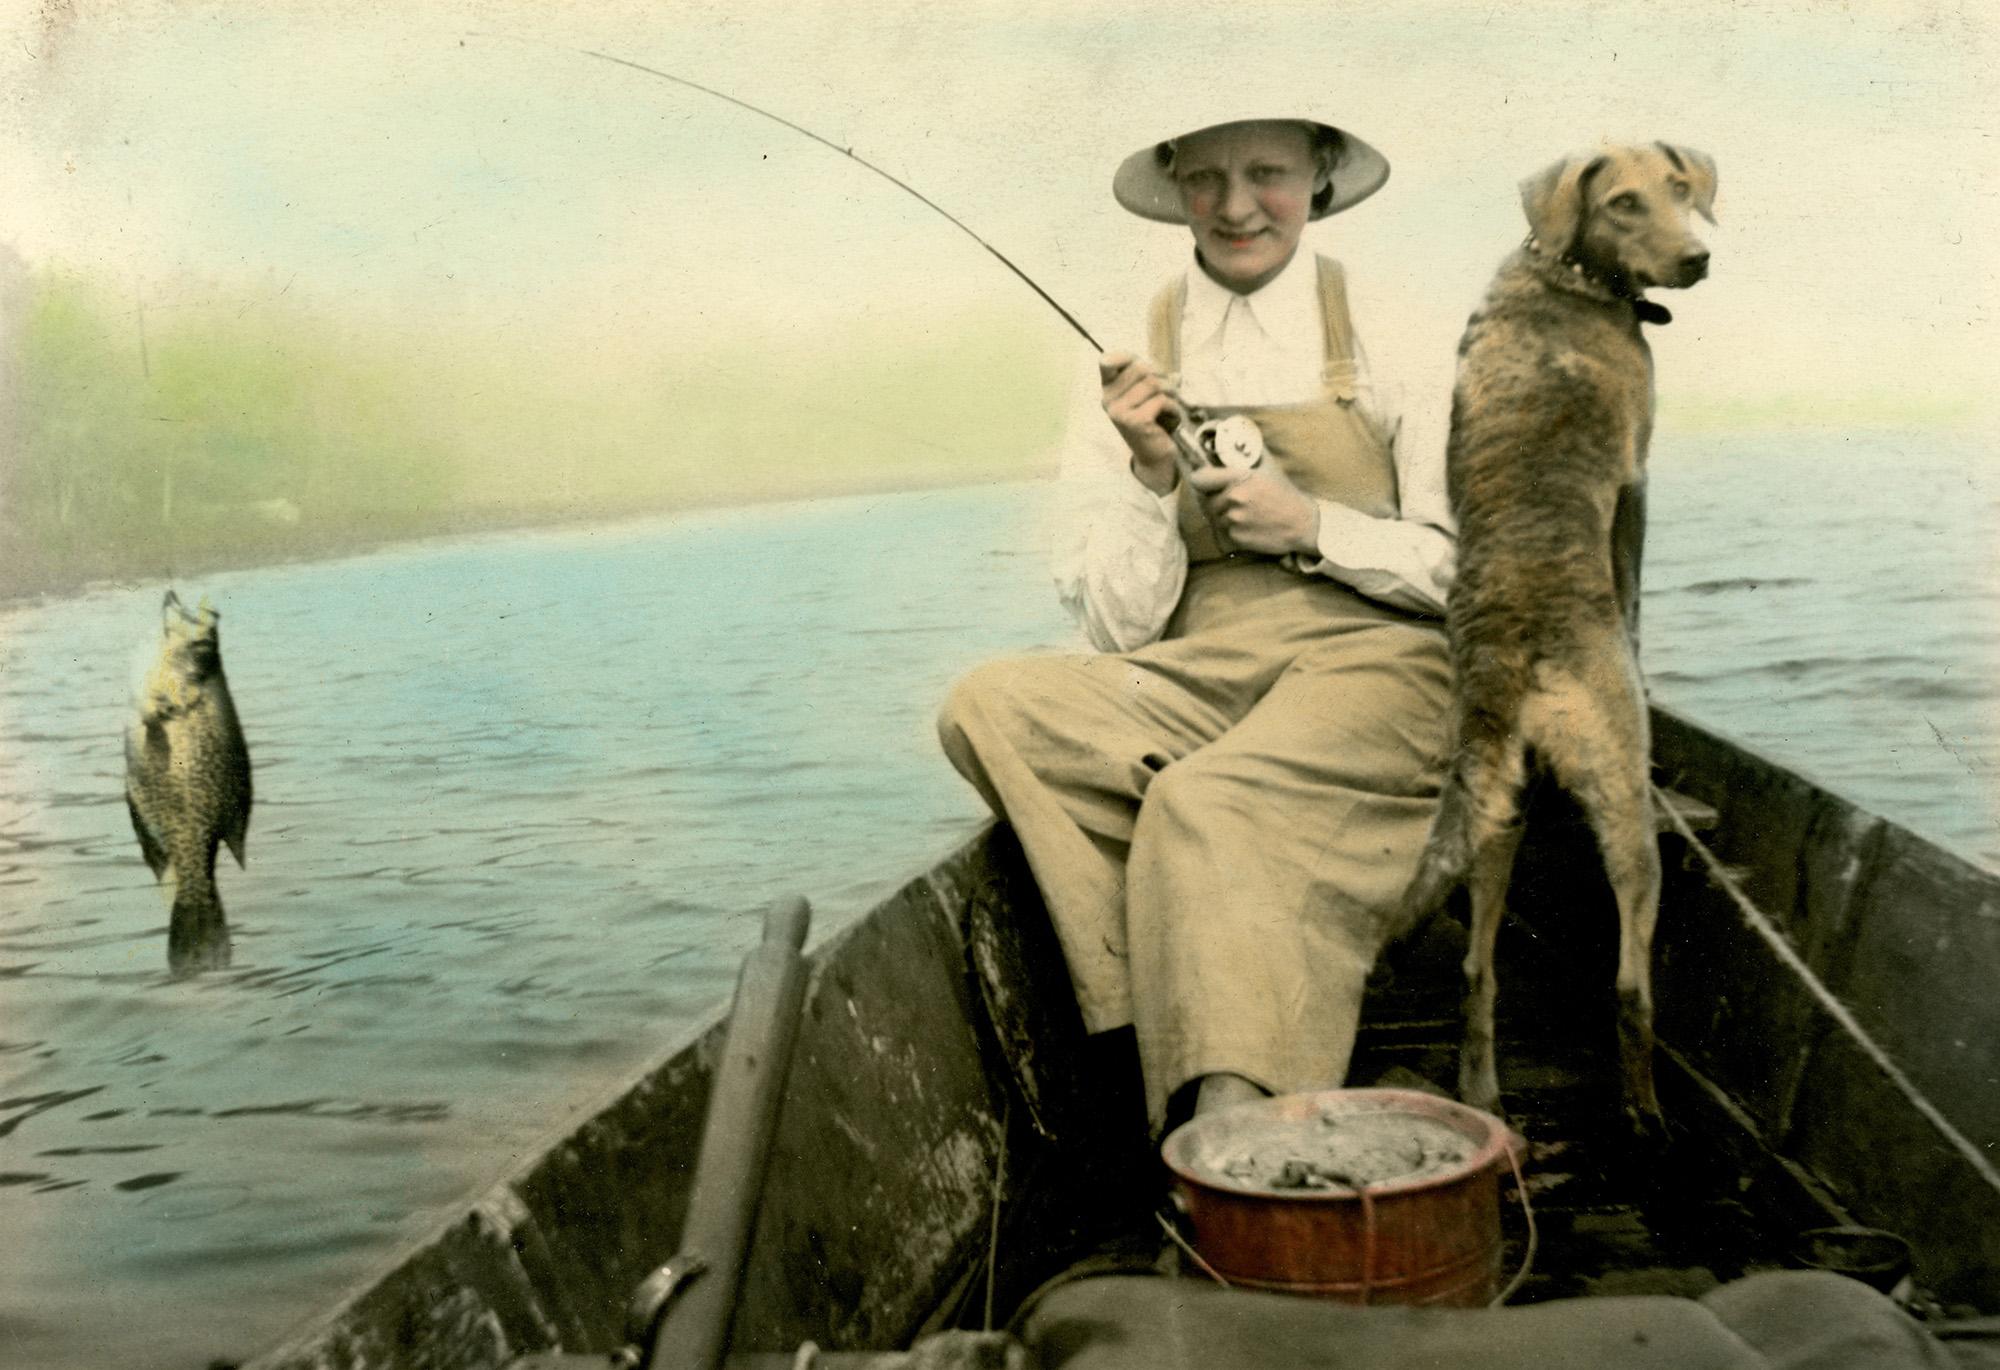 Hand-tinted photograph, ca. 1935